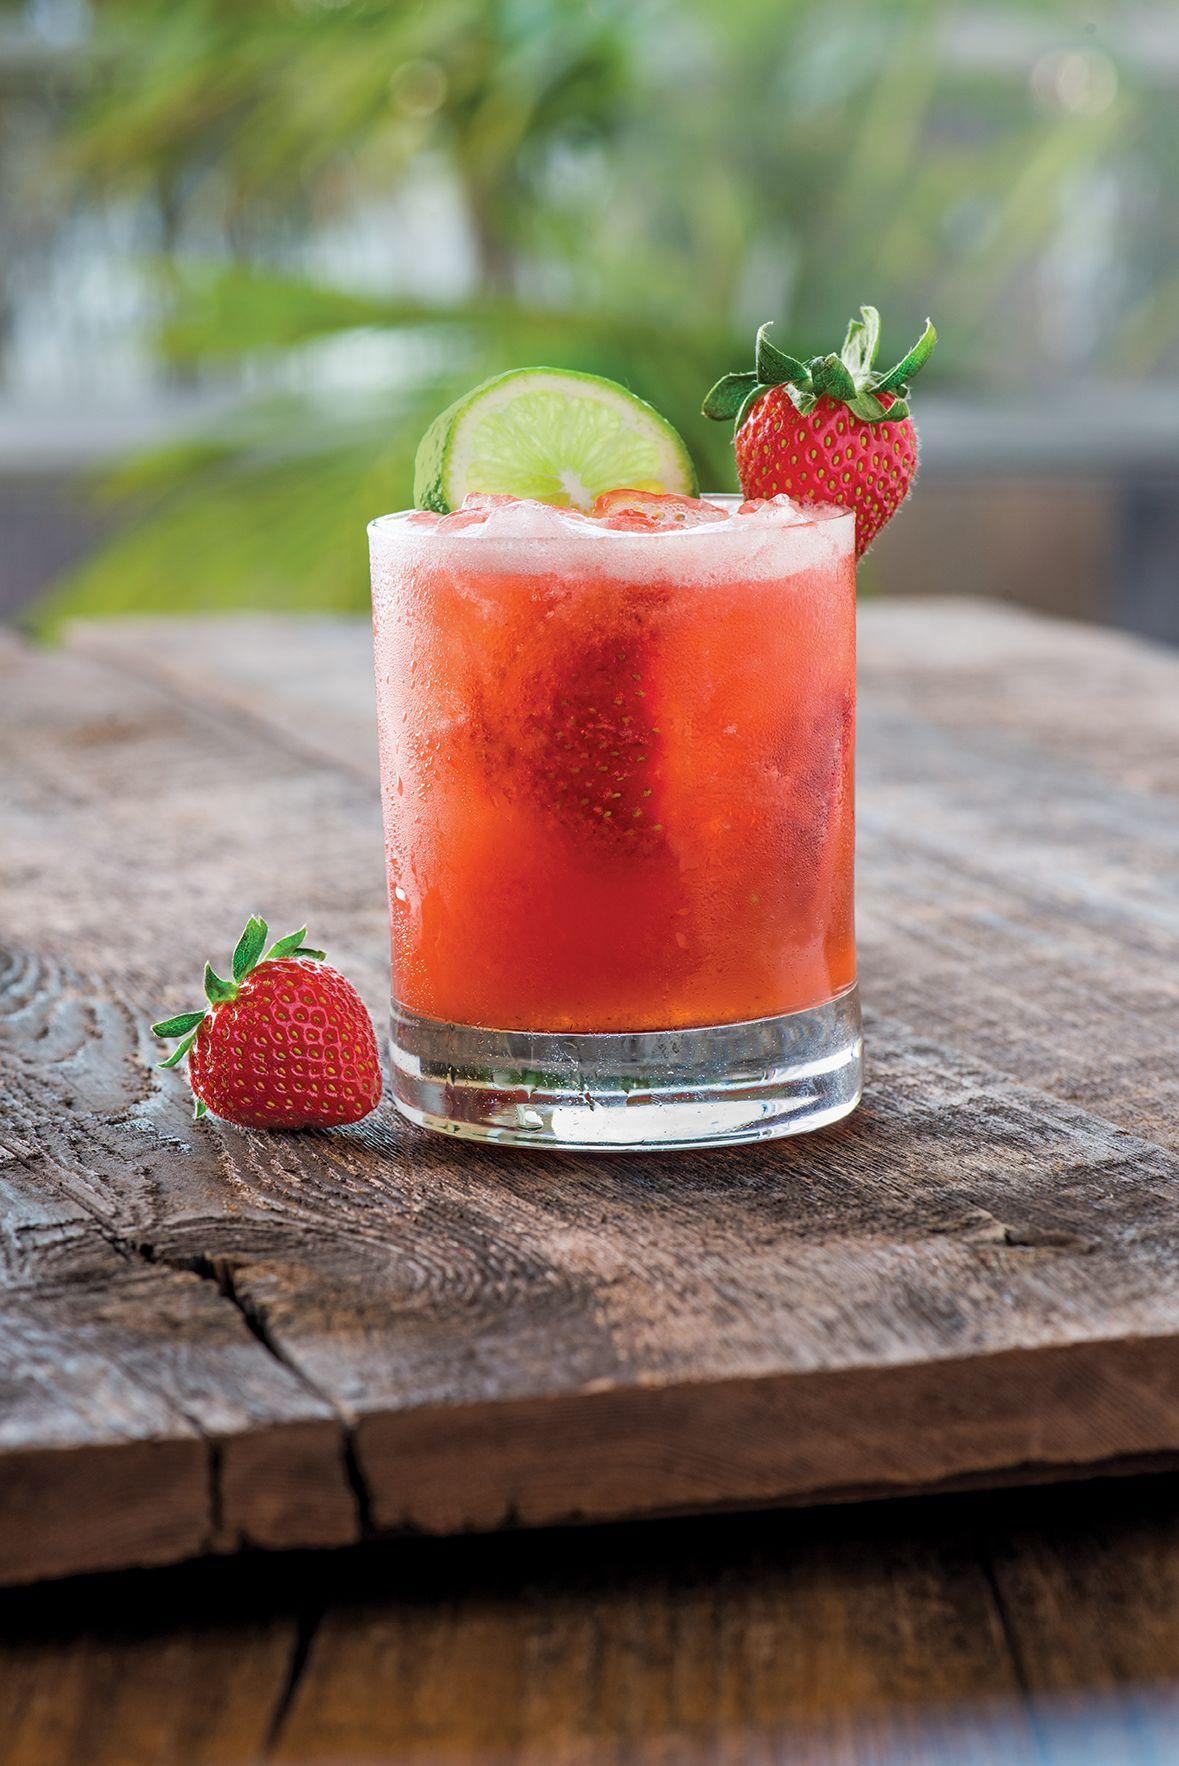 California Pizza Kitchen Palm Beach Gardens Mickey Finn Strawberry Margarita Drinks Pinterest Strawberry